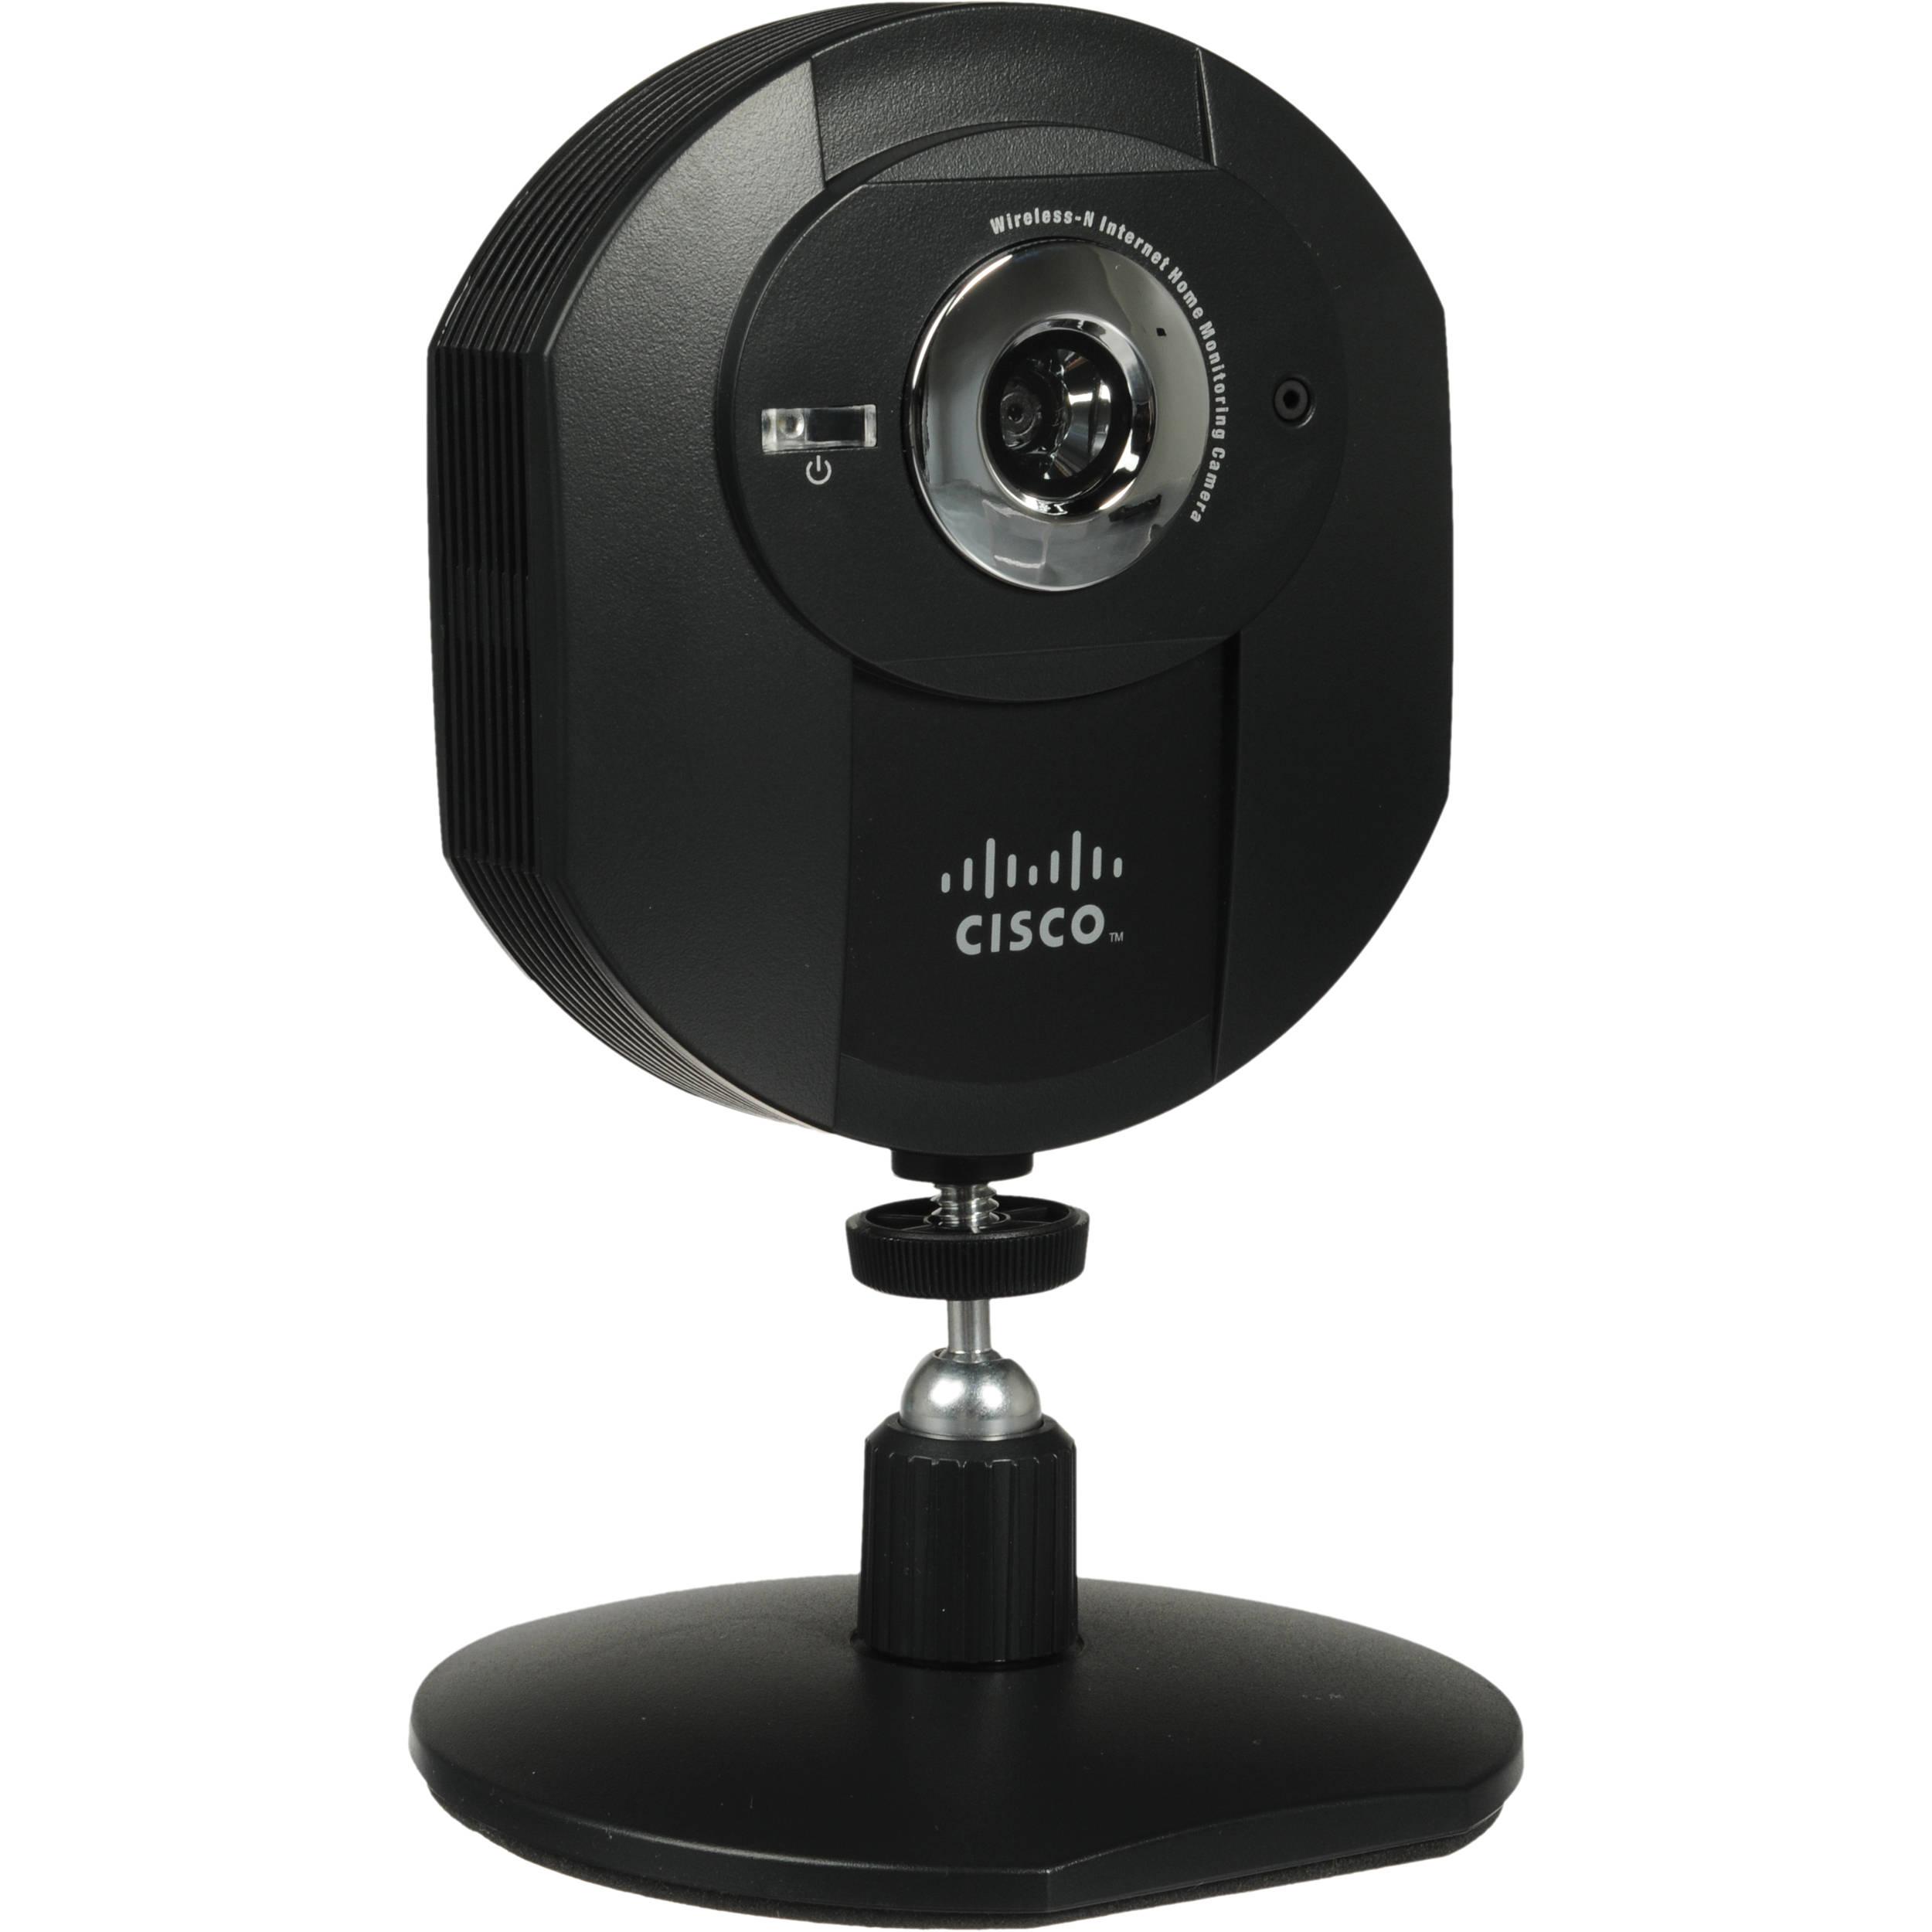 Linksys Wireless-N Internet Home Monitoring Camera